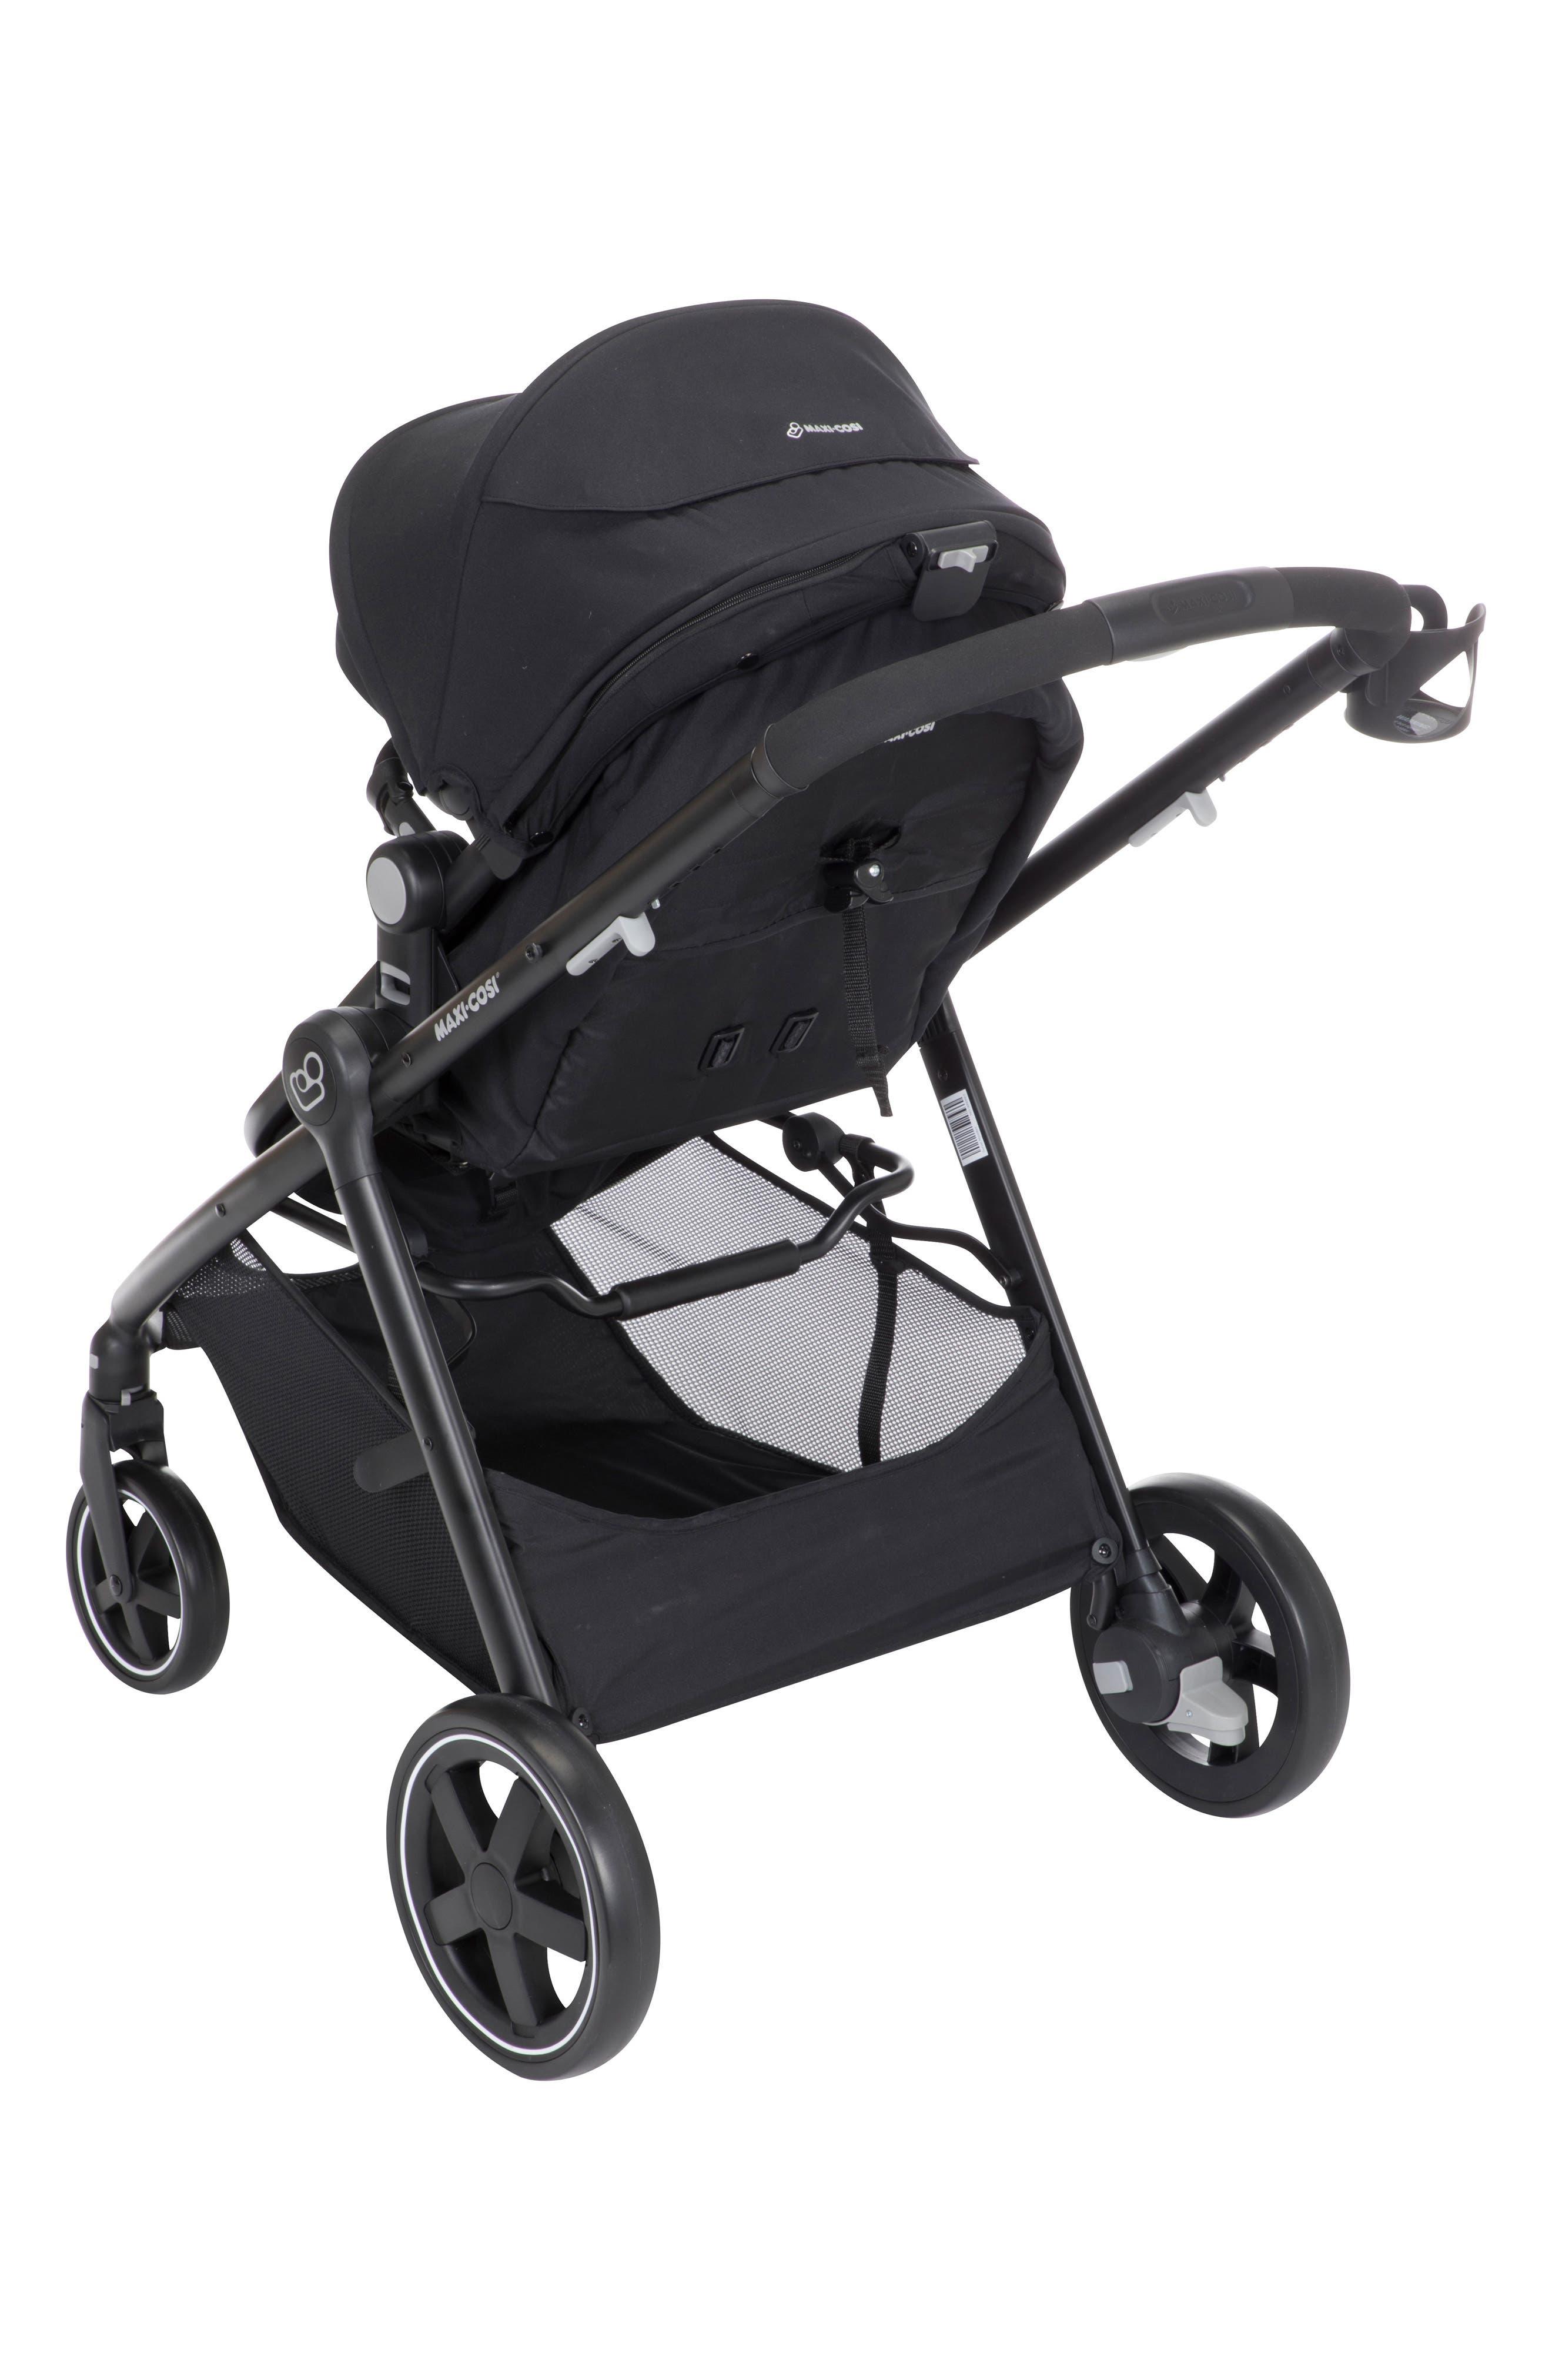 5-1 Mico 30 Infant Car Seat & Zelia Stroller Modular Travel System,                             Alternate thumbnail 5, color,                             NIGHT BLACK